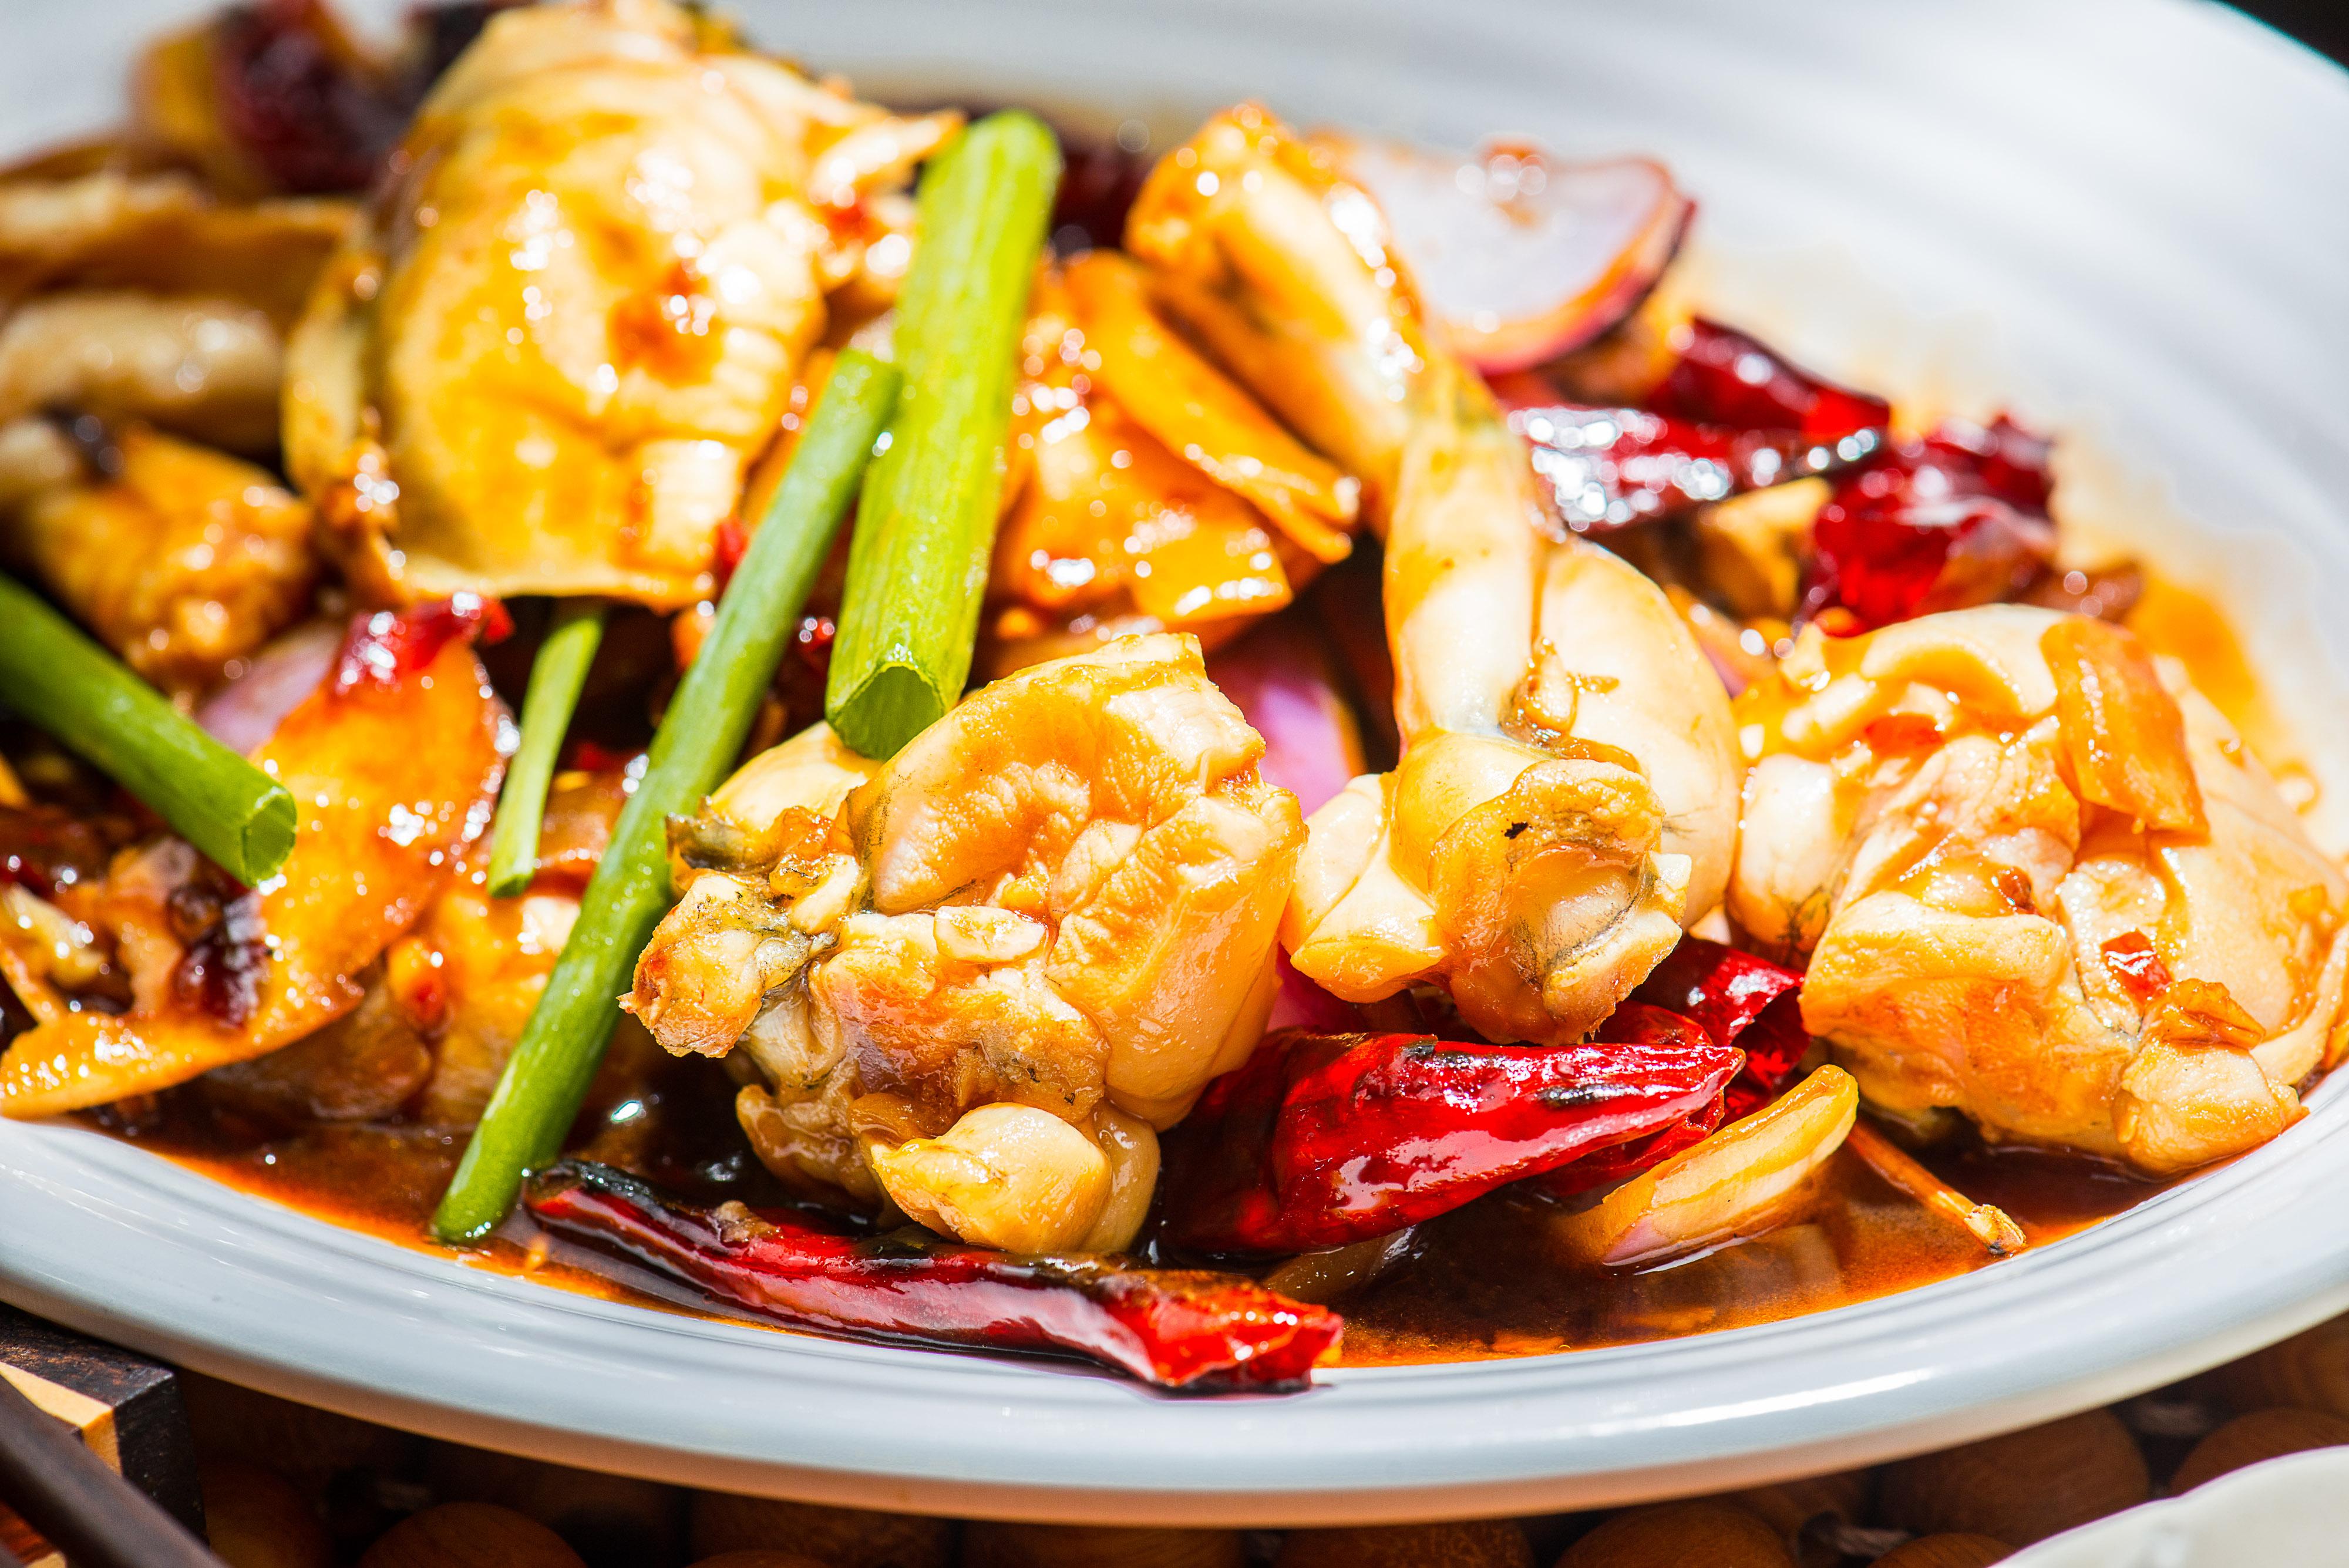 KL Food Photographer - Kung Po Chick